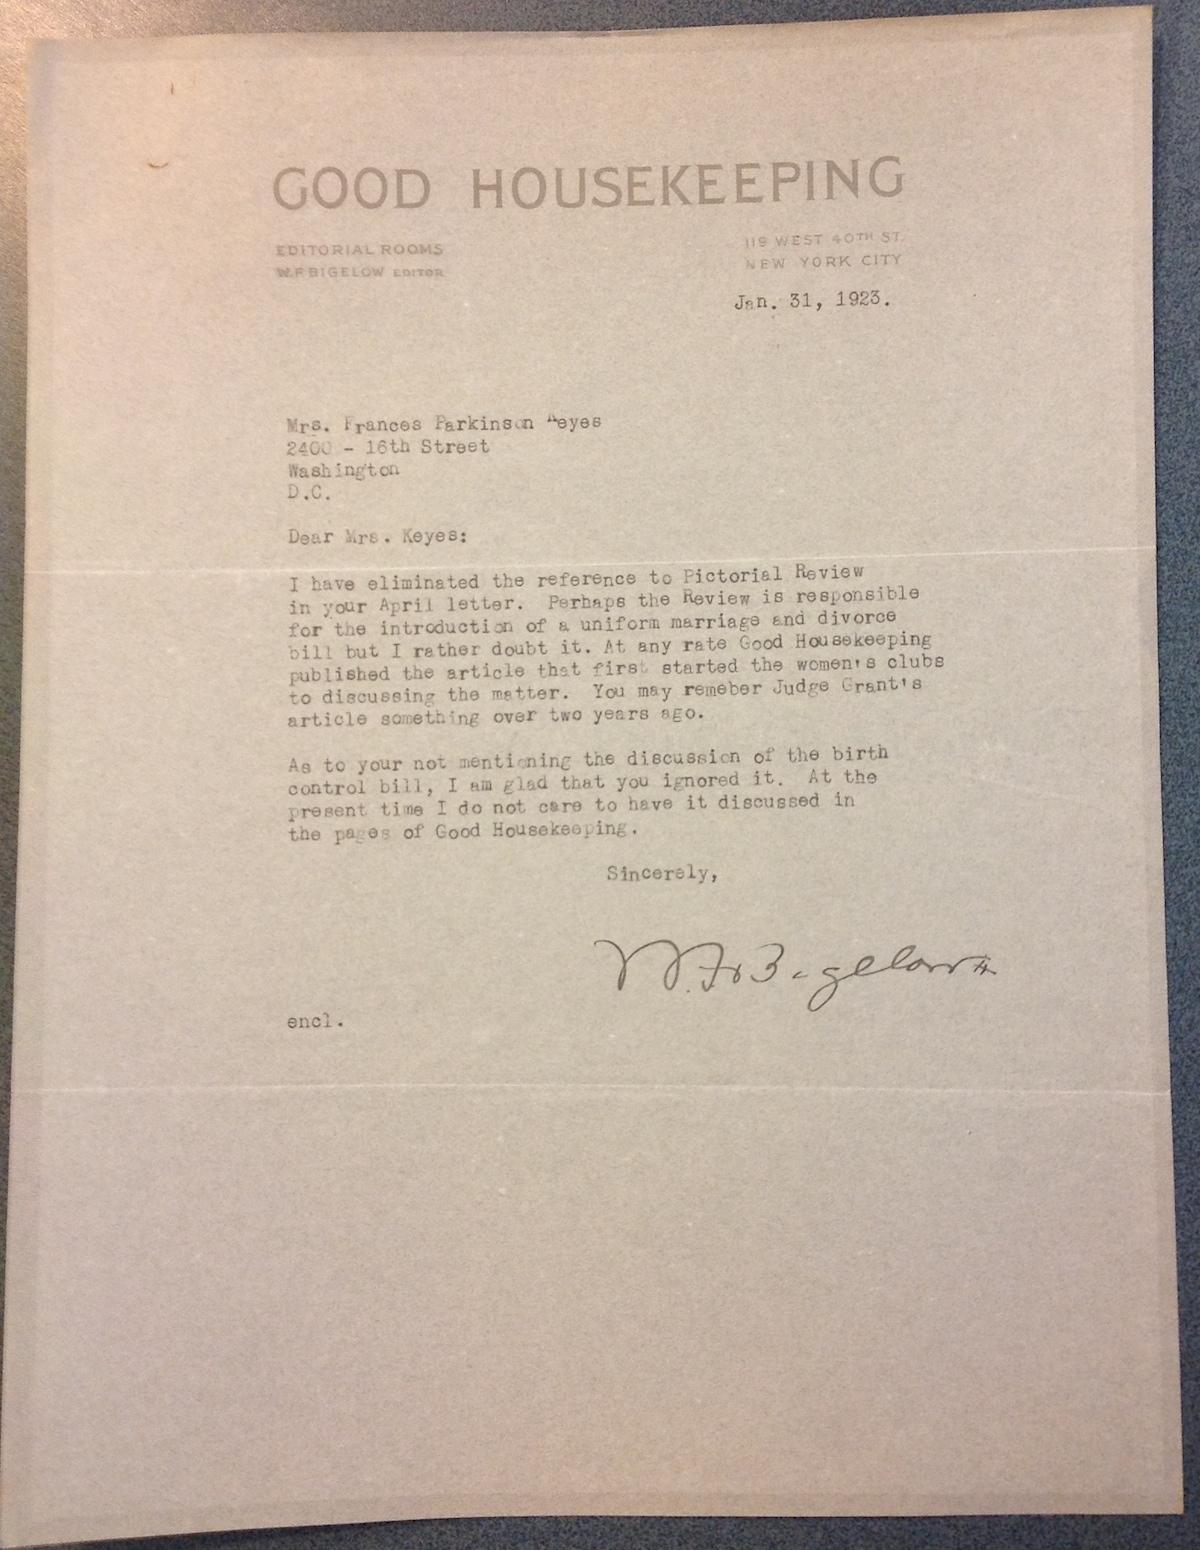 William Frederick Bigelow to FPK, January 31, 1923